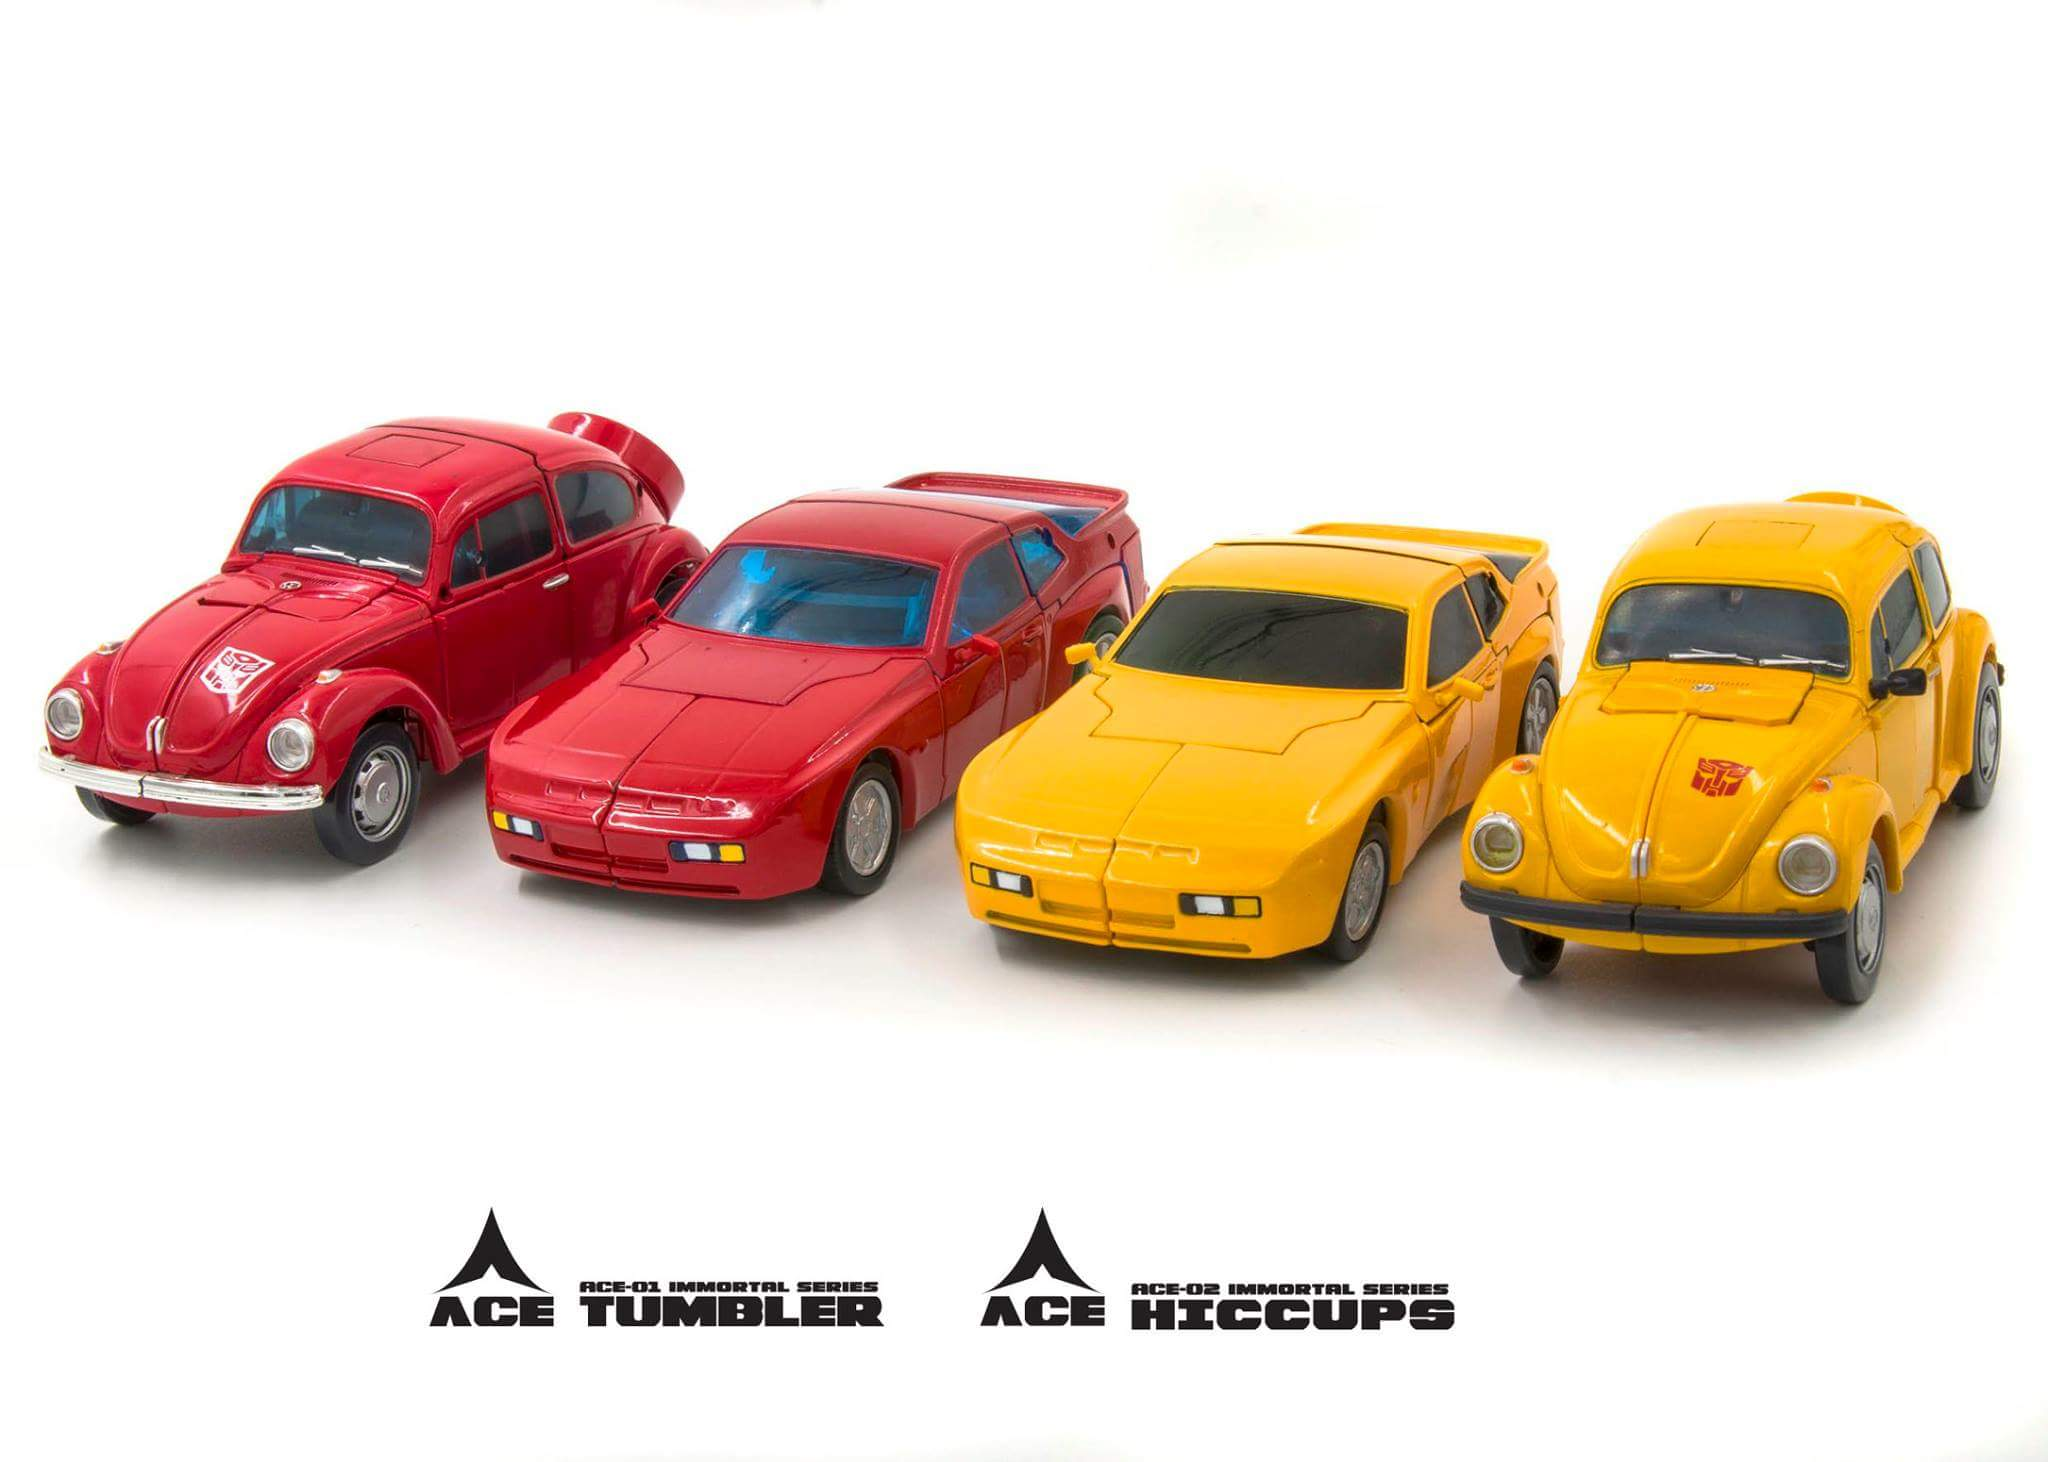 [ACE Collectables] Produit Tiers - Minibots MP - ACE-01 Tumbler (aka Cliffjumper/Matamore), ACE-02 Hiccups (aka Hubcap/Virevolto), ACE-03 Trident (aka Seaspray/Embruns) FuBX3g7i